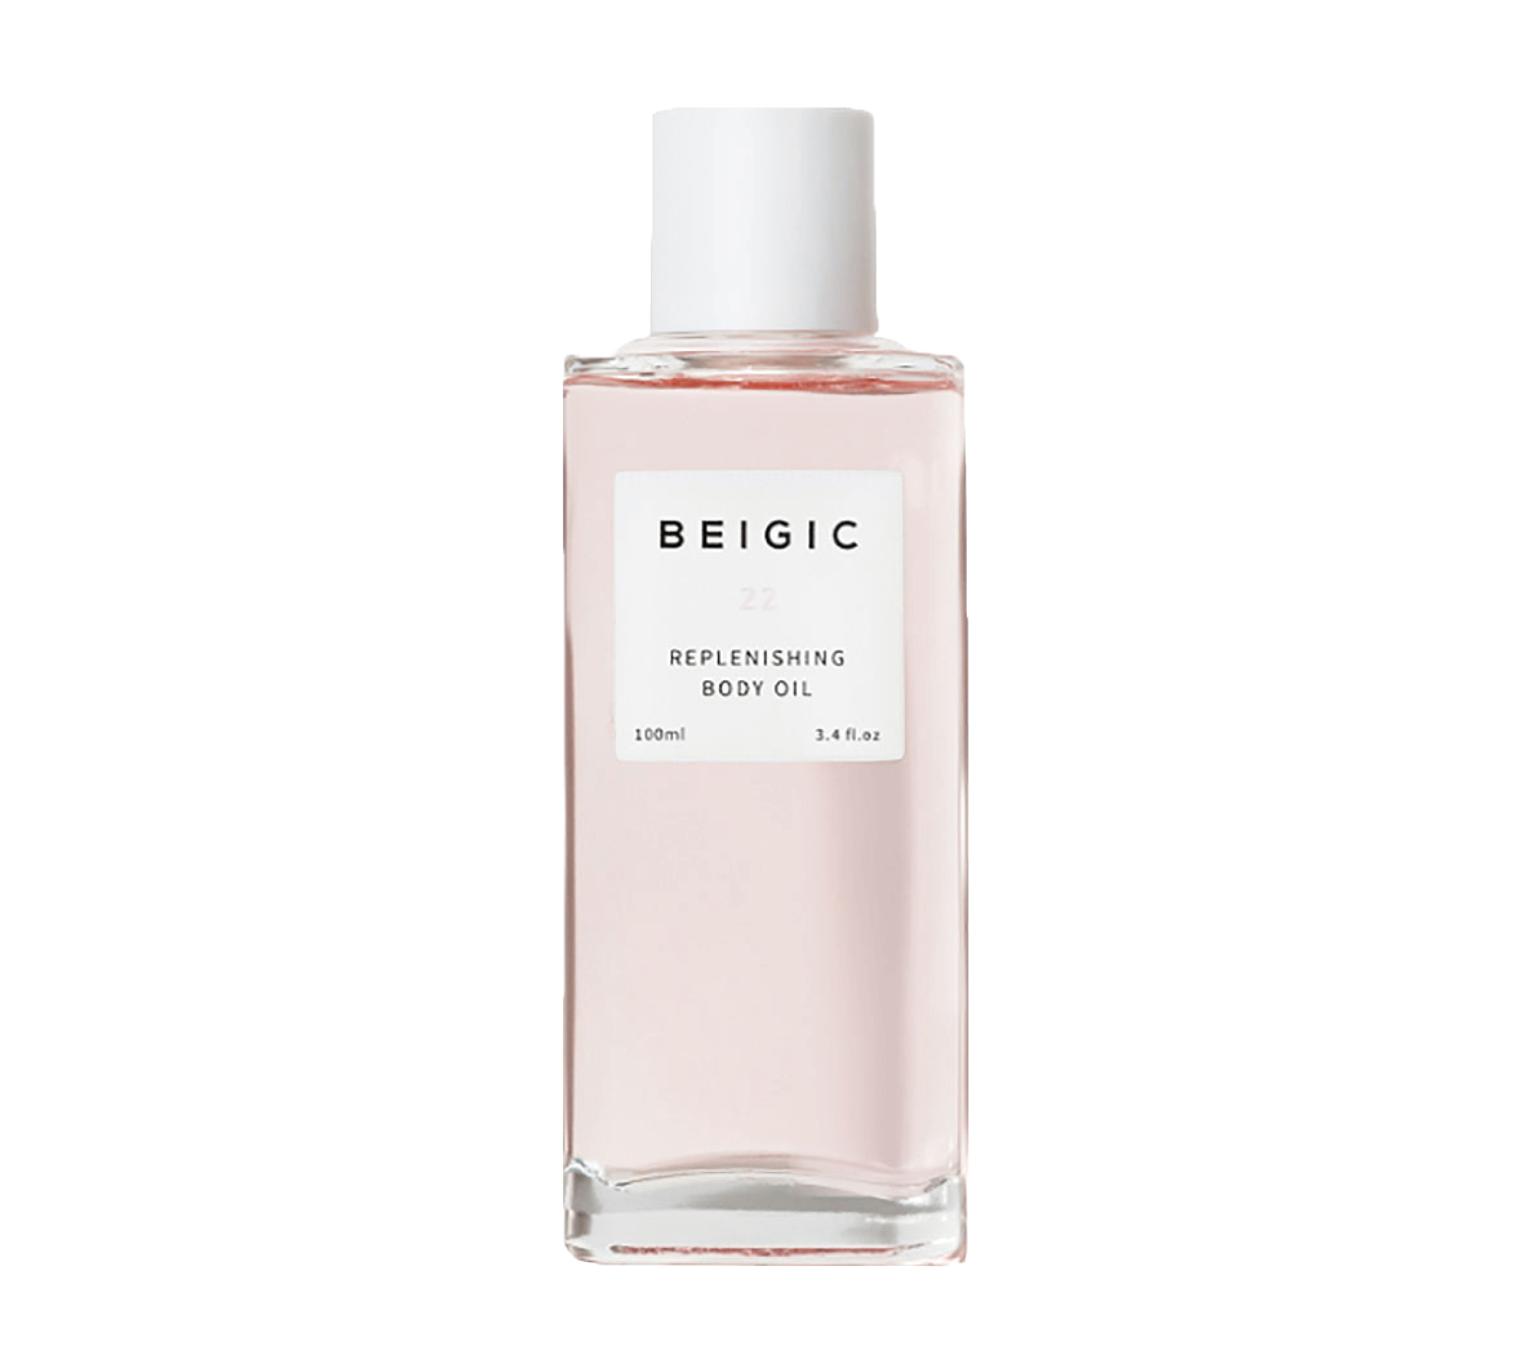 BEIGIC-replenishing-body-oil